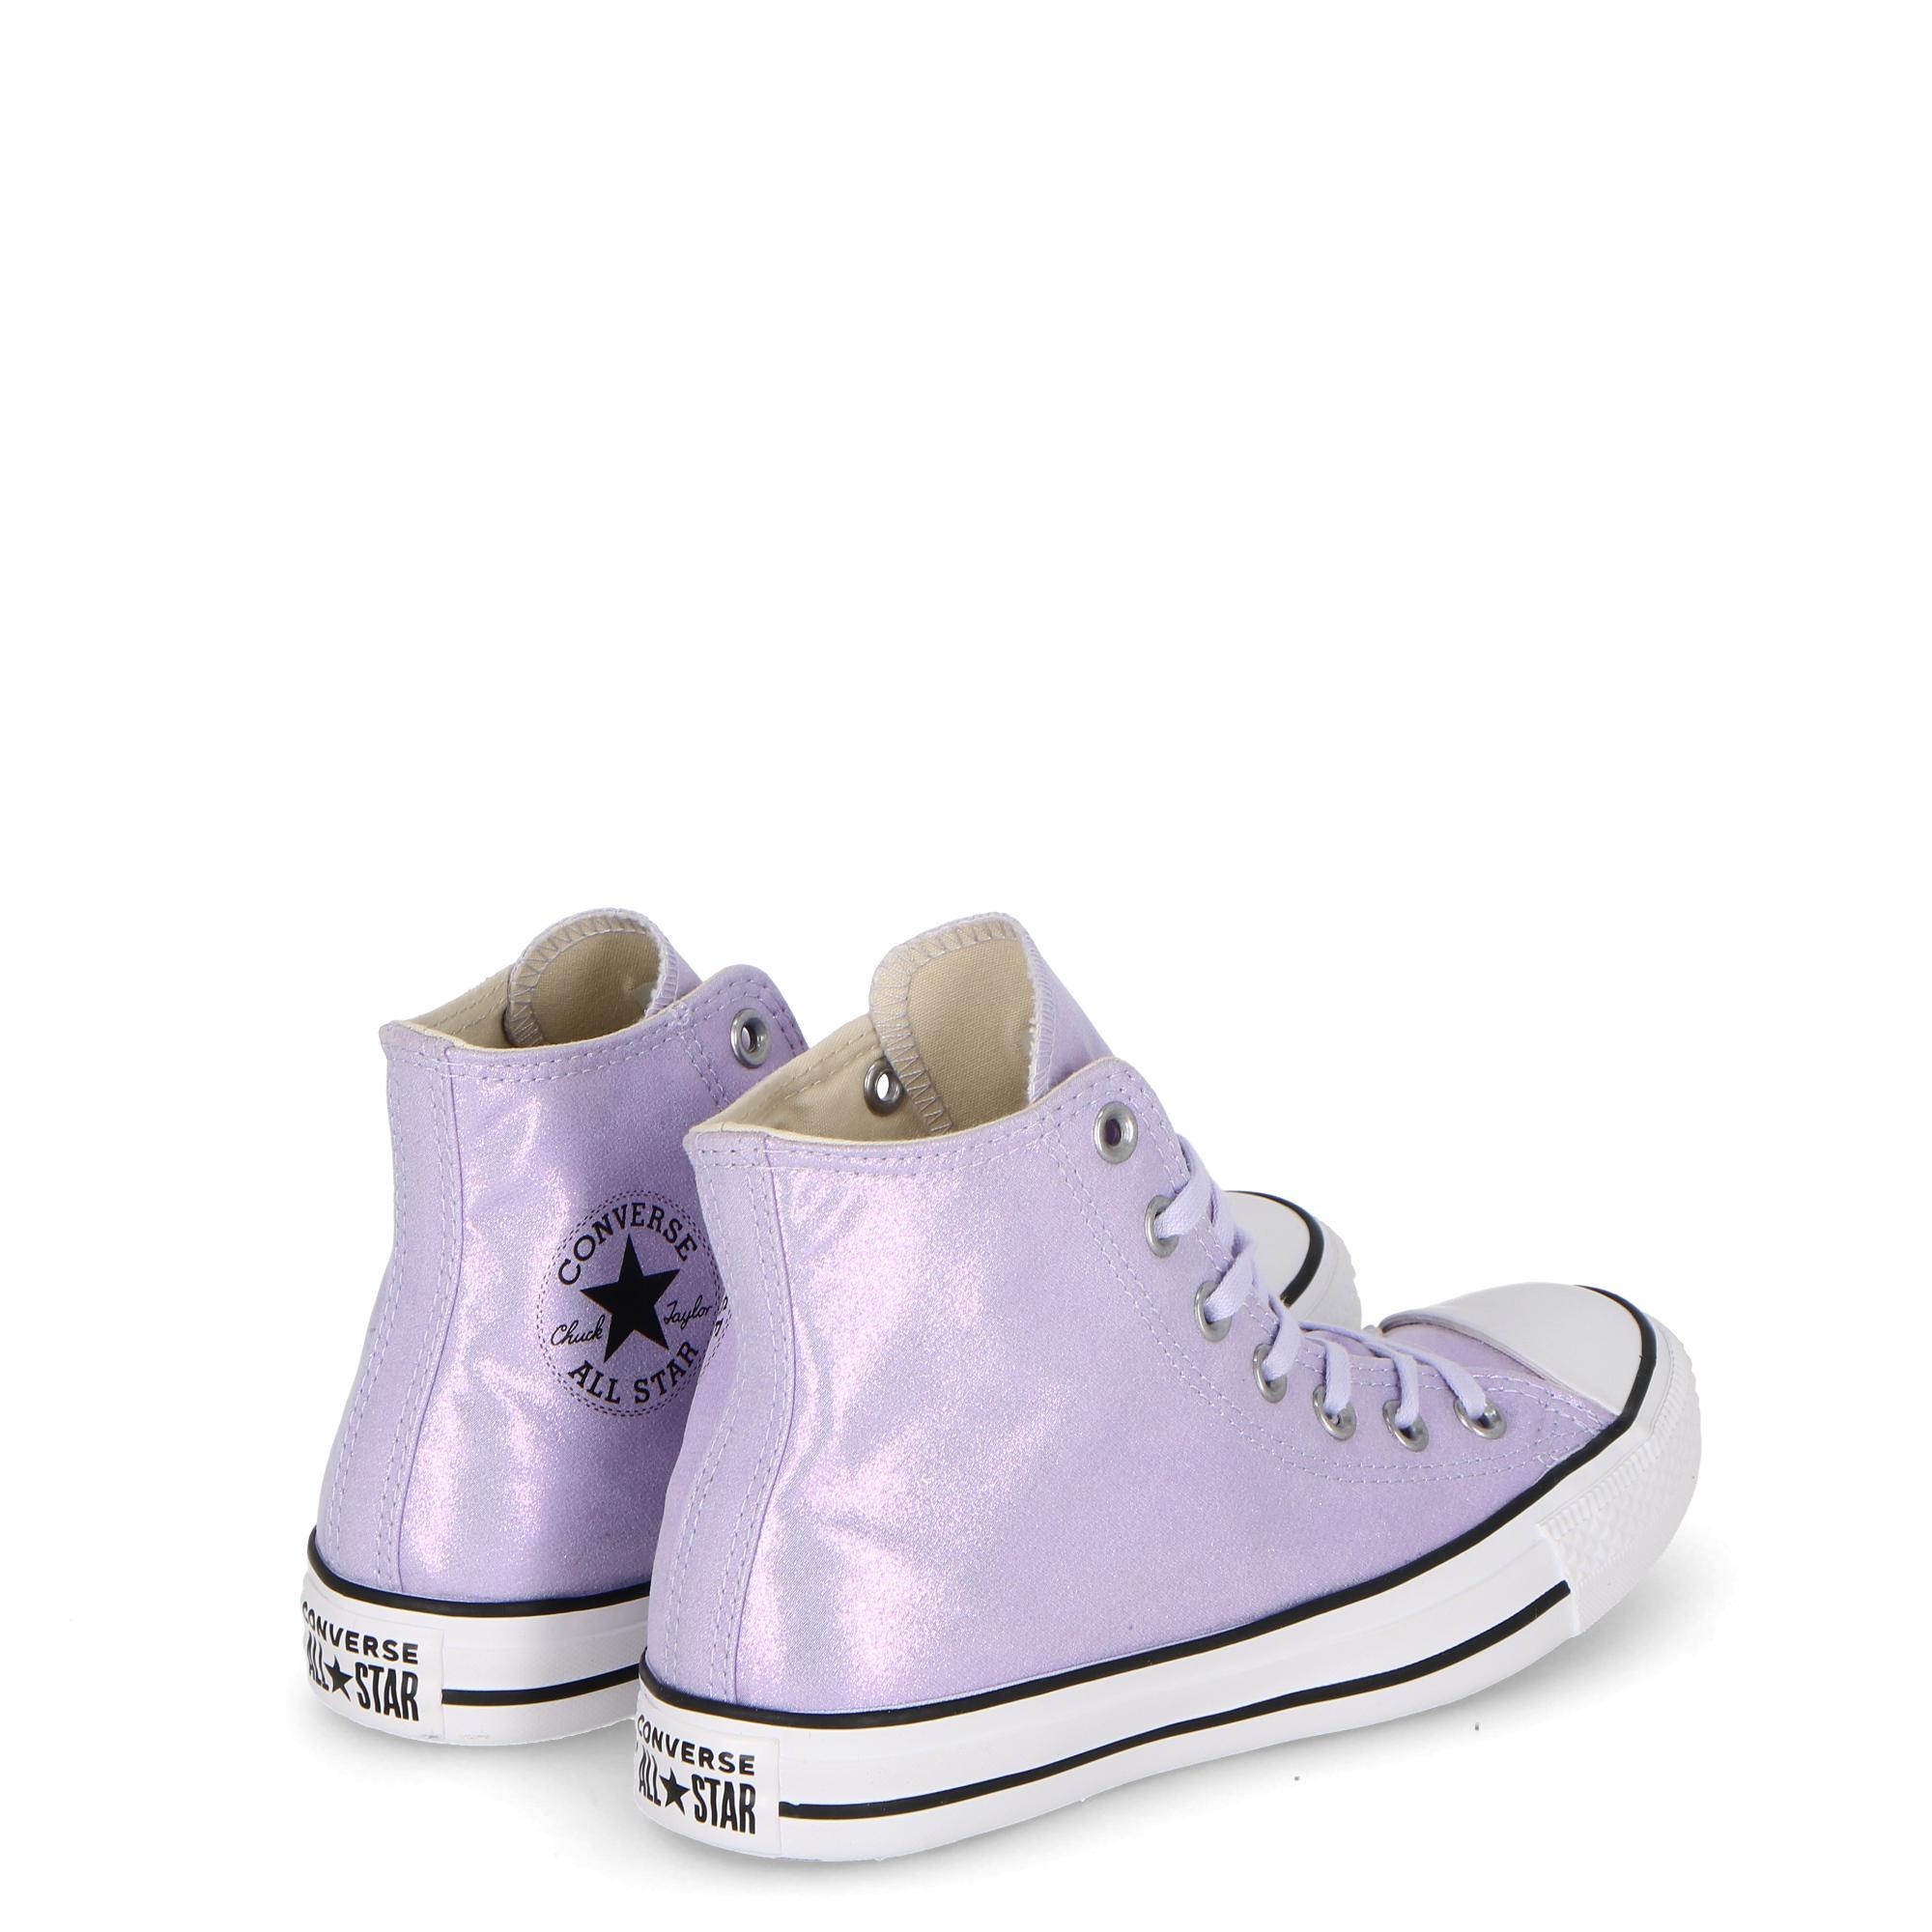 Hi Oxygen All Chuck Taylor PurpleblackTreesse Star Converse WIHD9E2